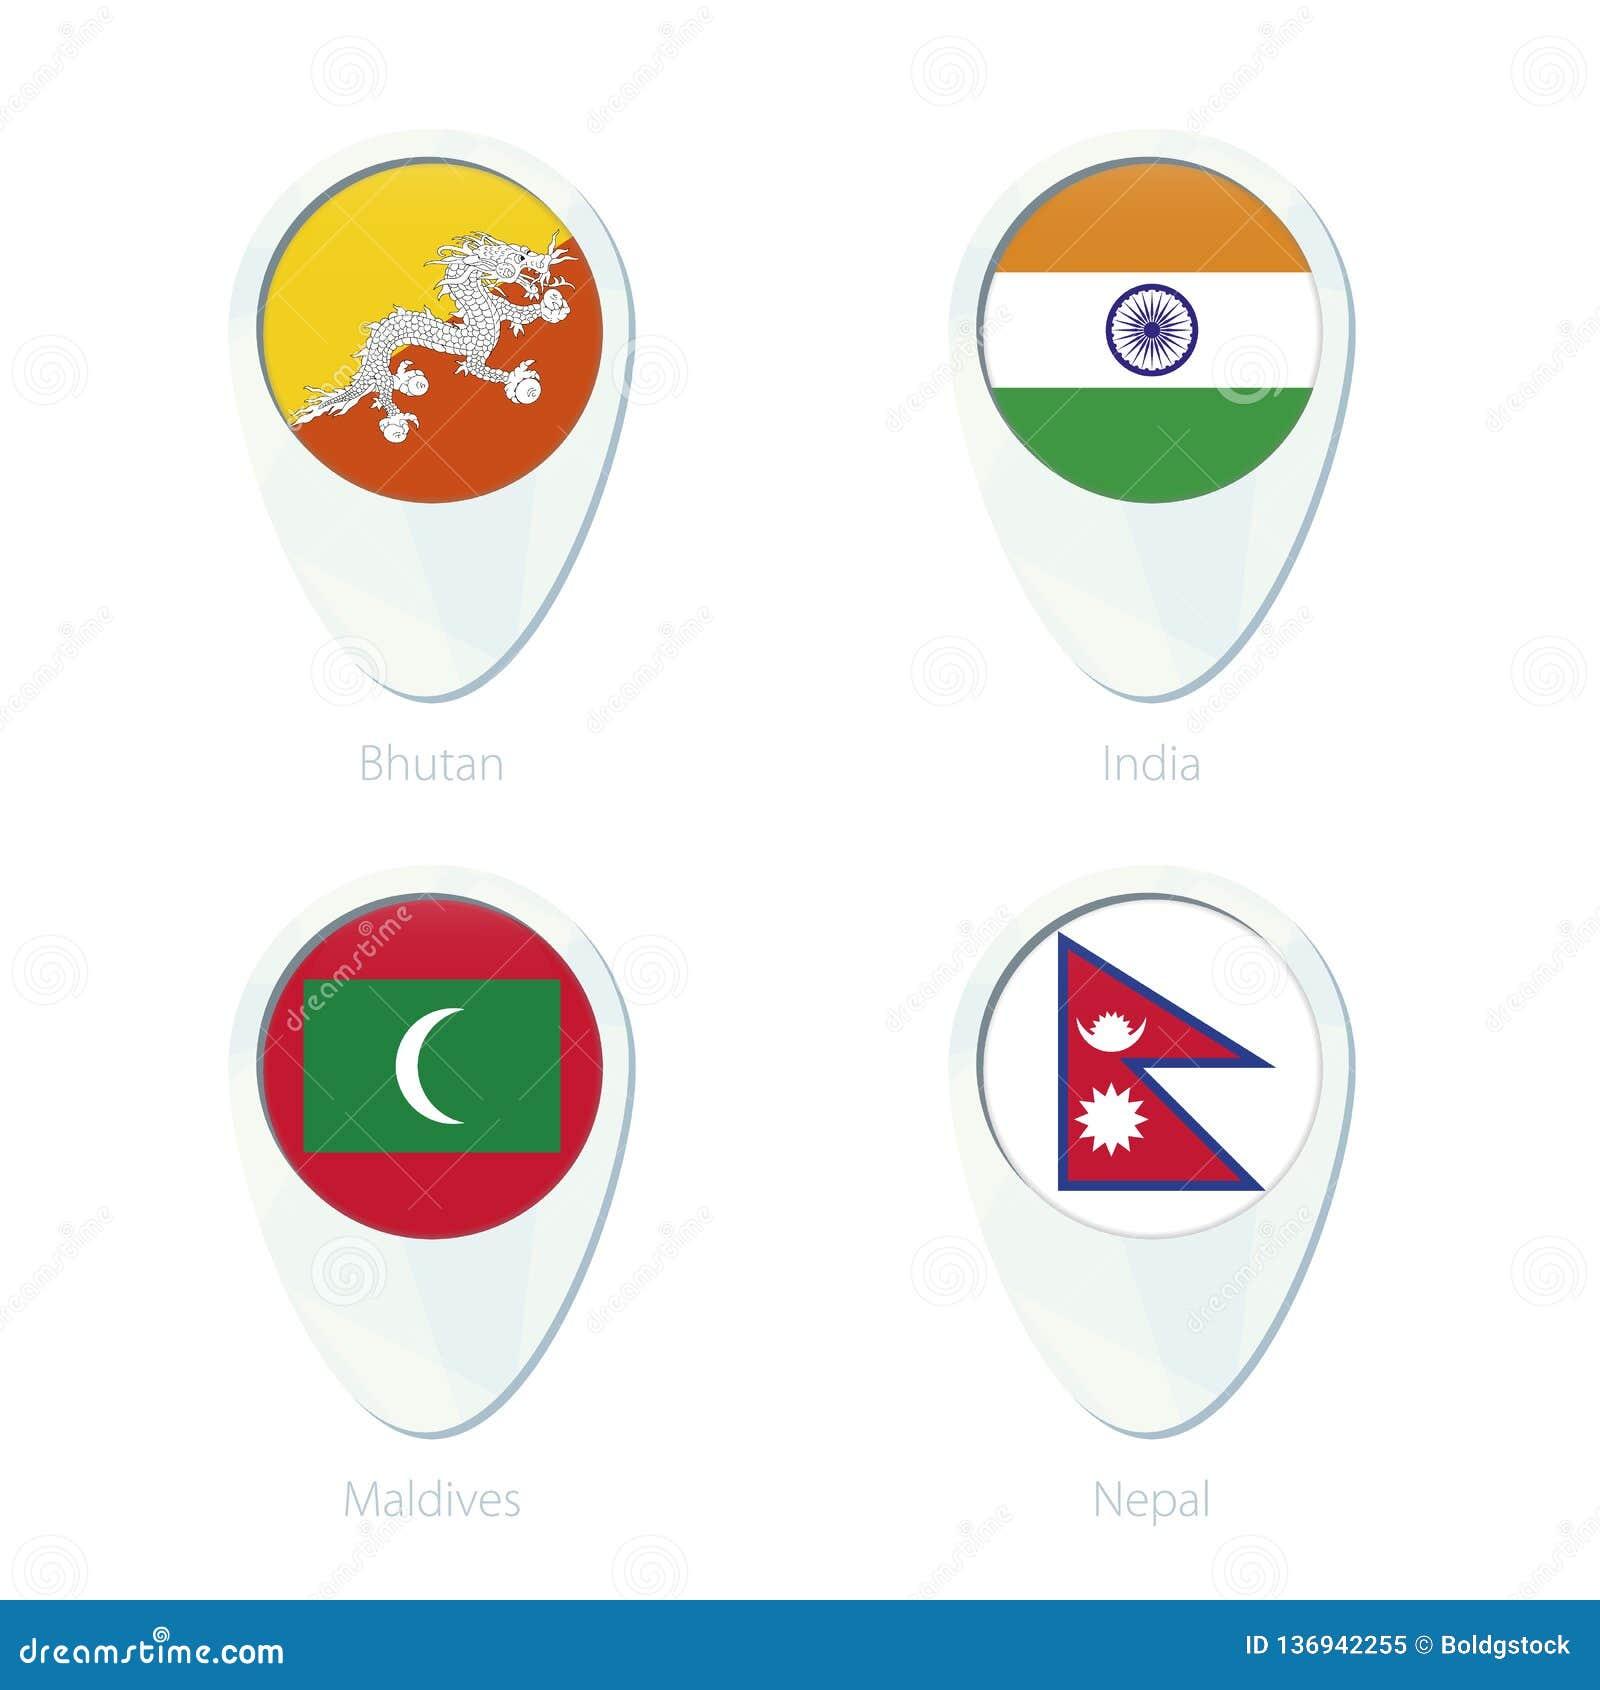 Bhutan, India, Maldives, Nepal Flag Location Map Pin Icon ...